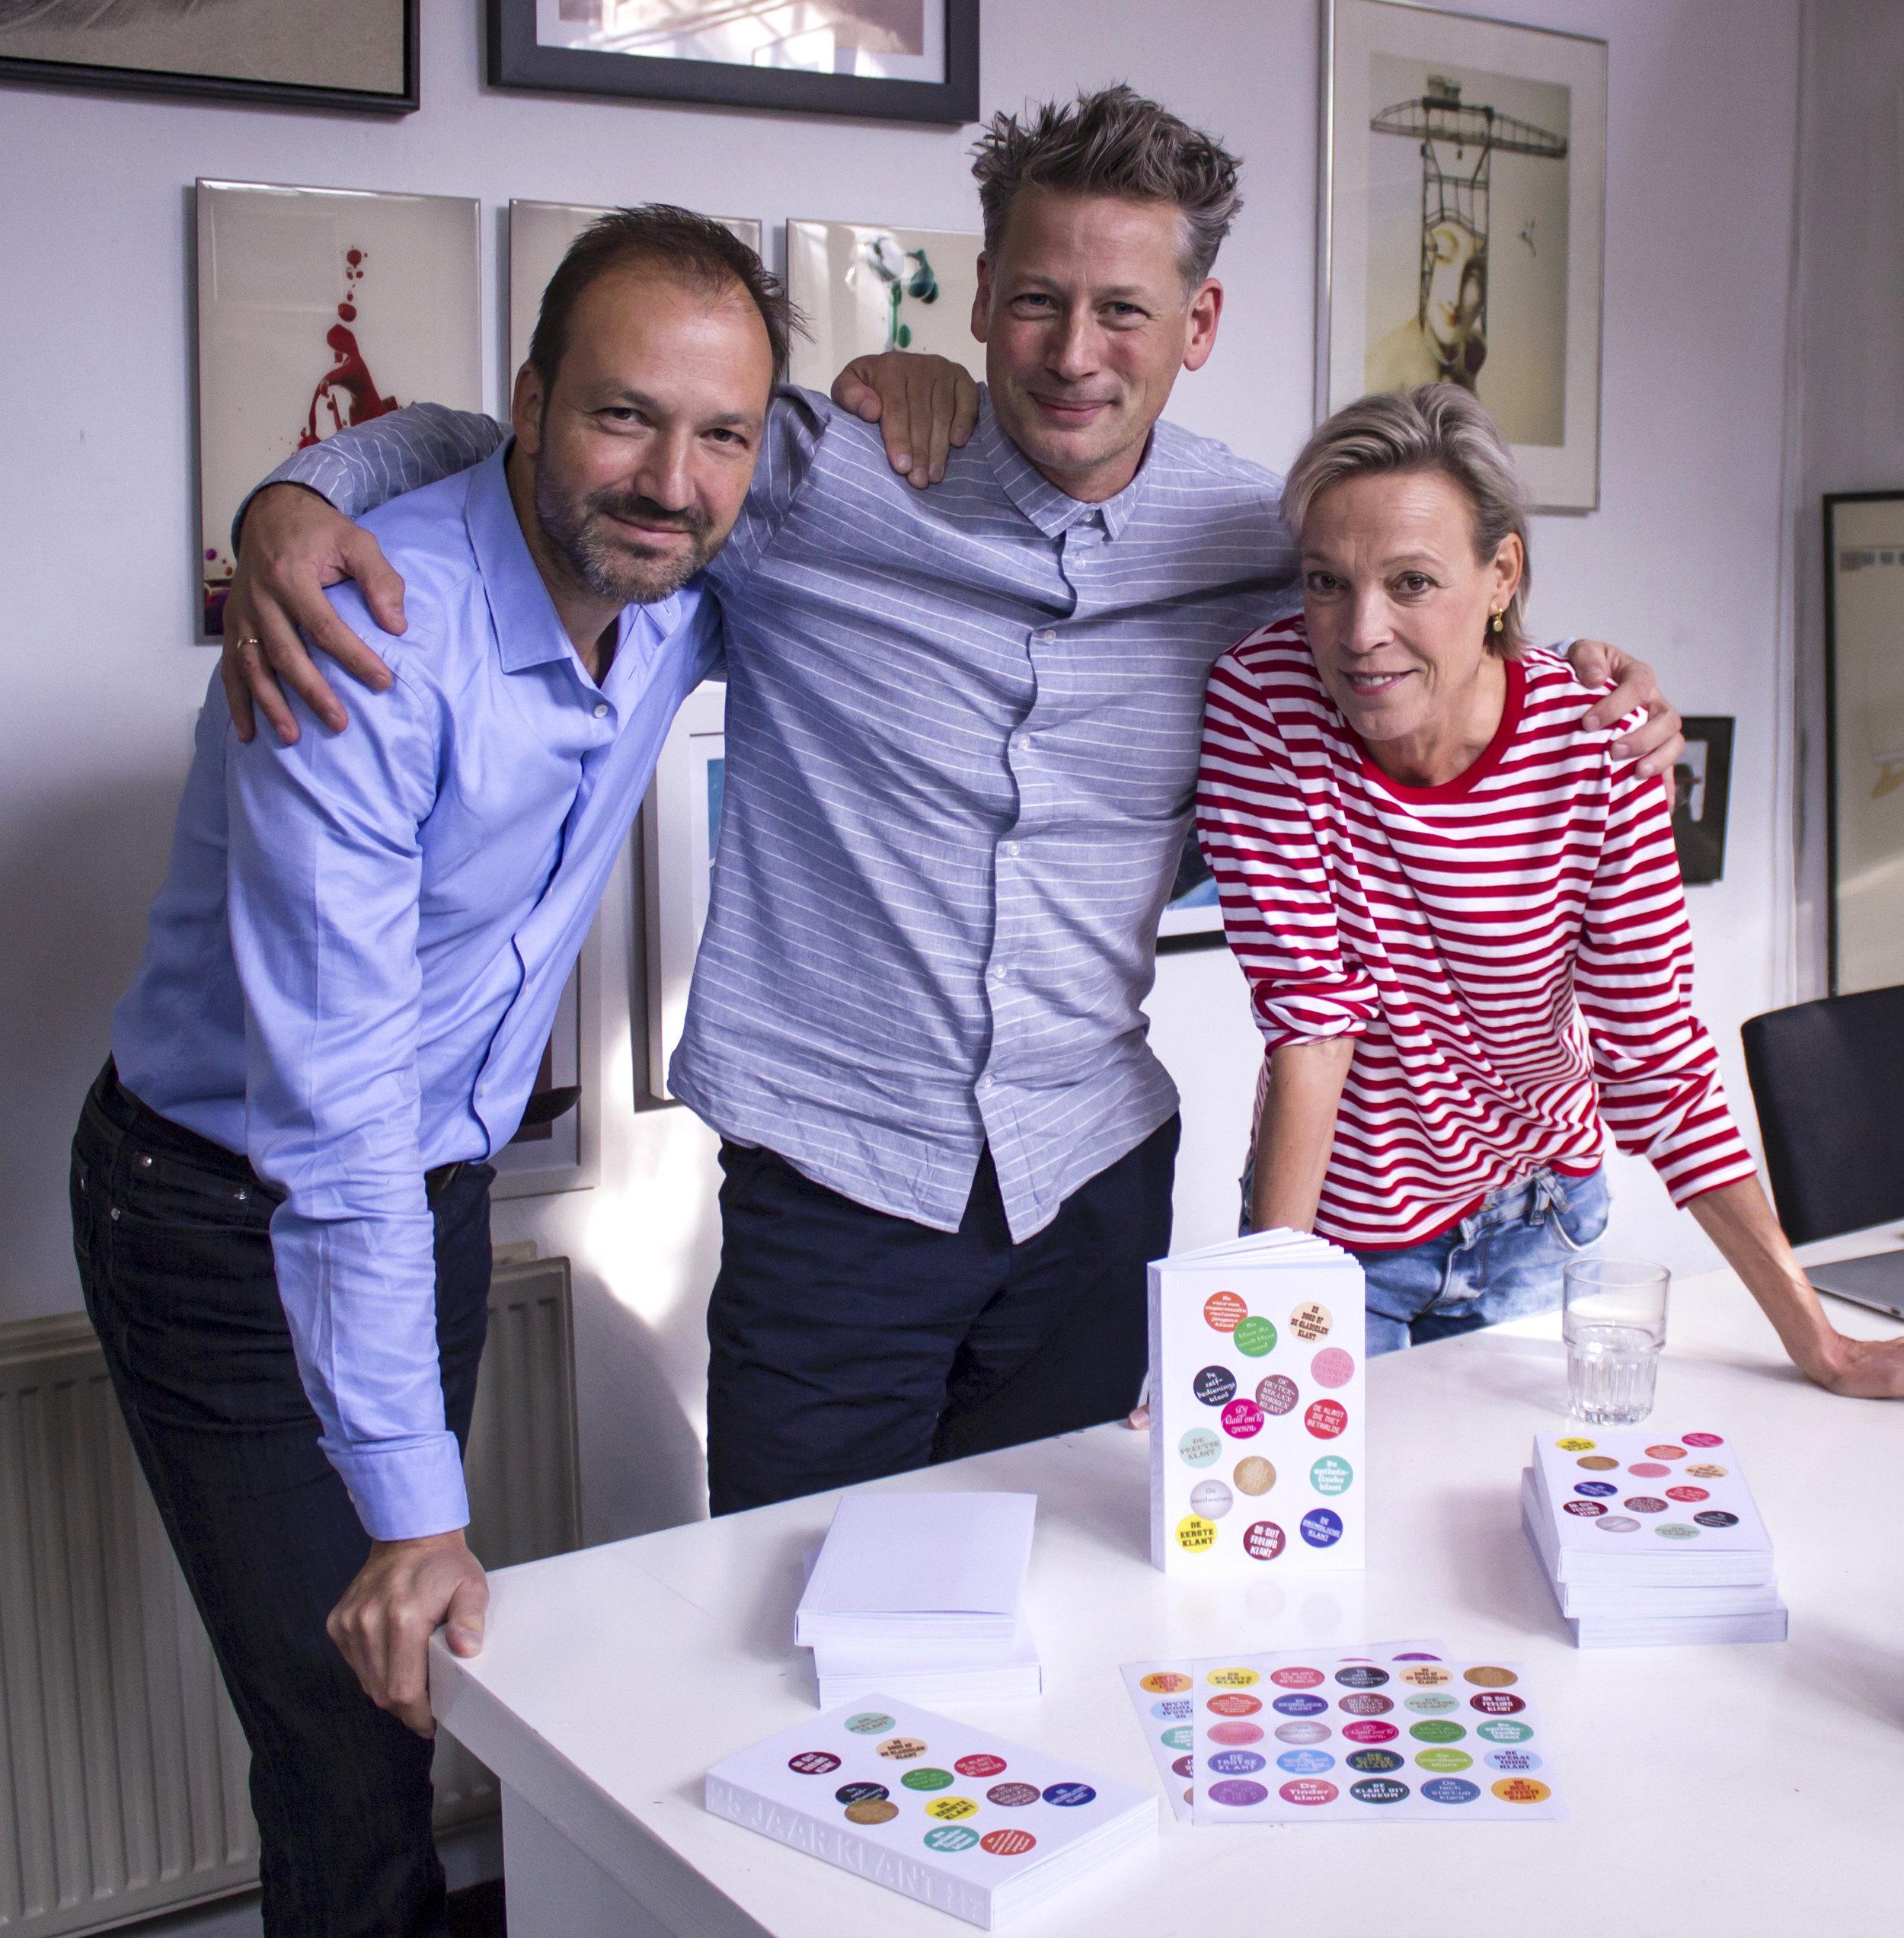 Foto Sneak preview '25 jaar klant' met Joeri Jansen.jpg